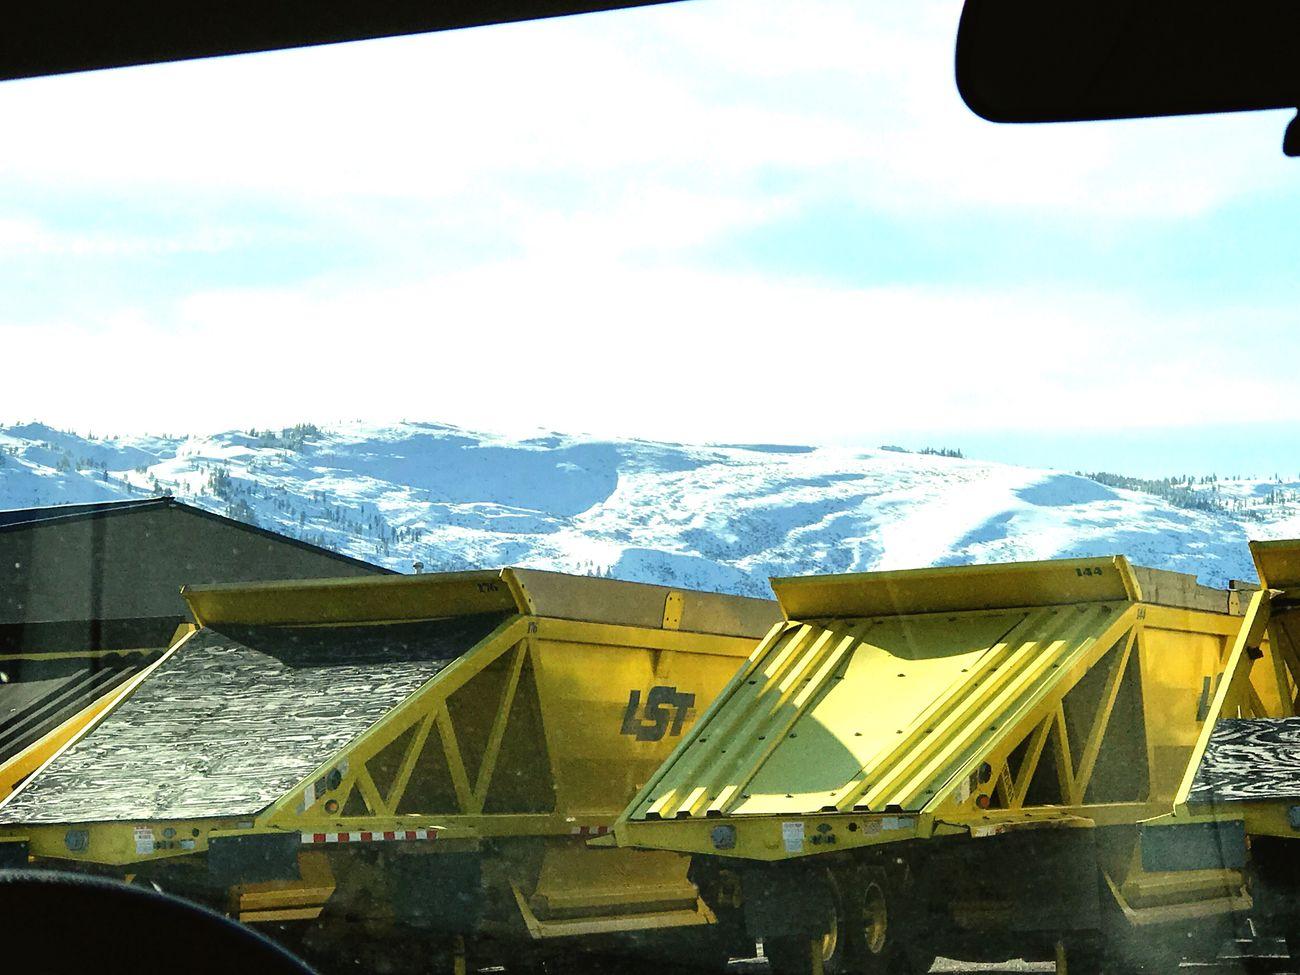 Snow Trucks Carrying Snow Mountain